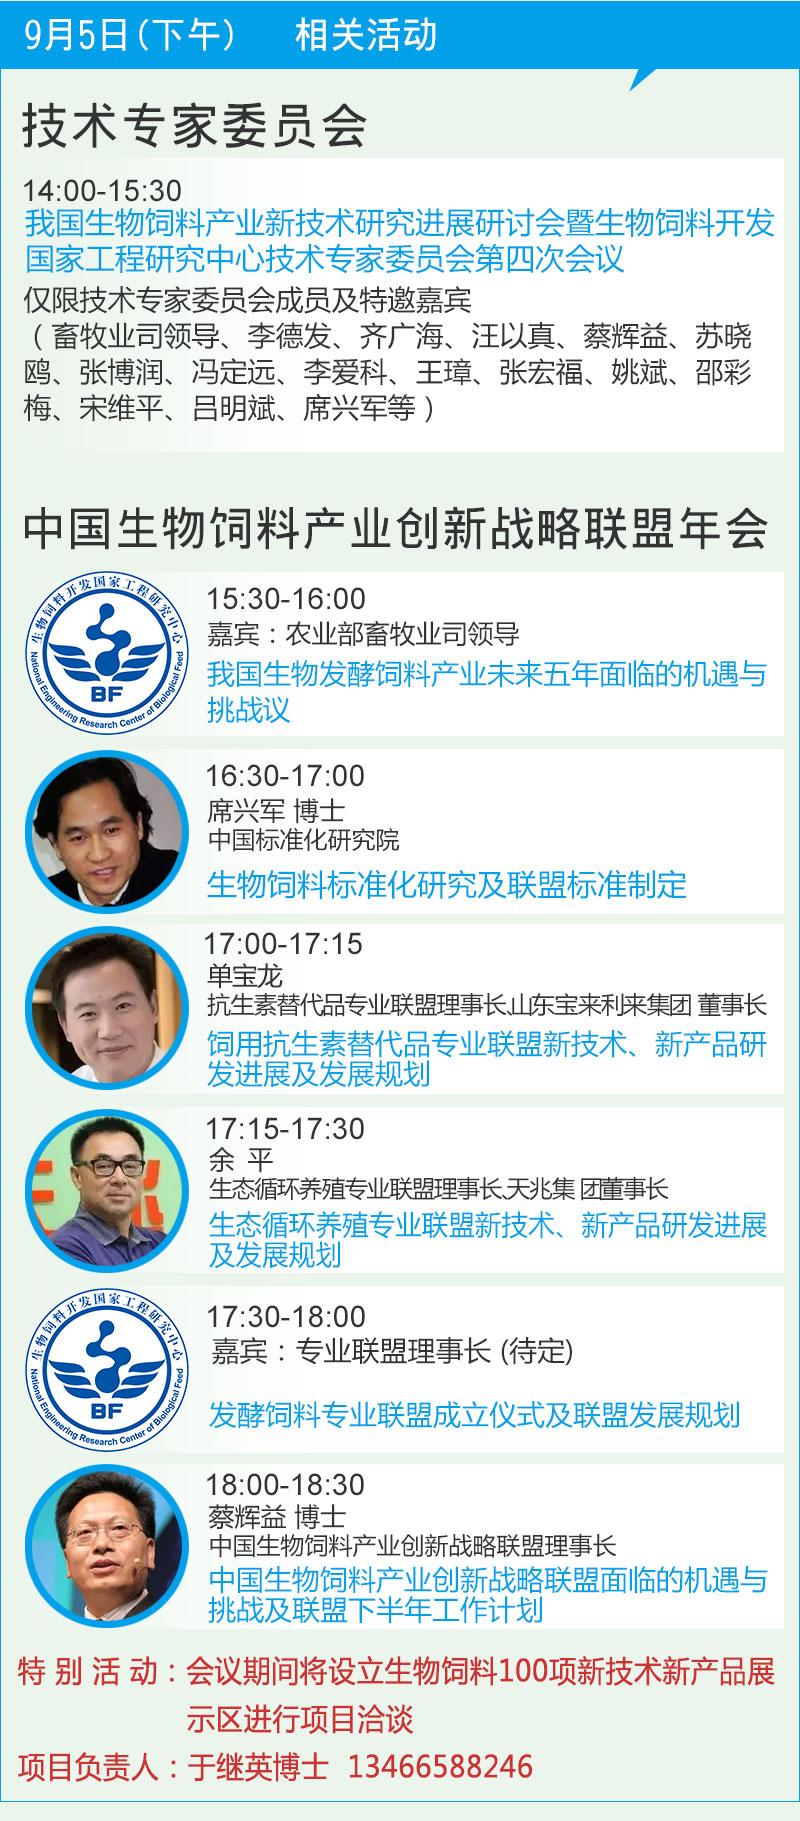 BFC﹒2016第四届中国生物饲料科技大会